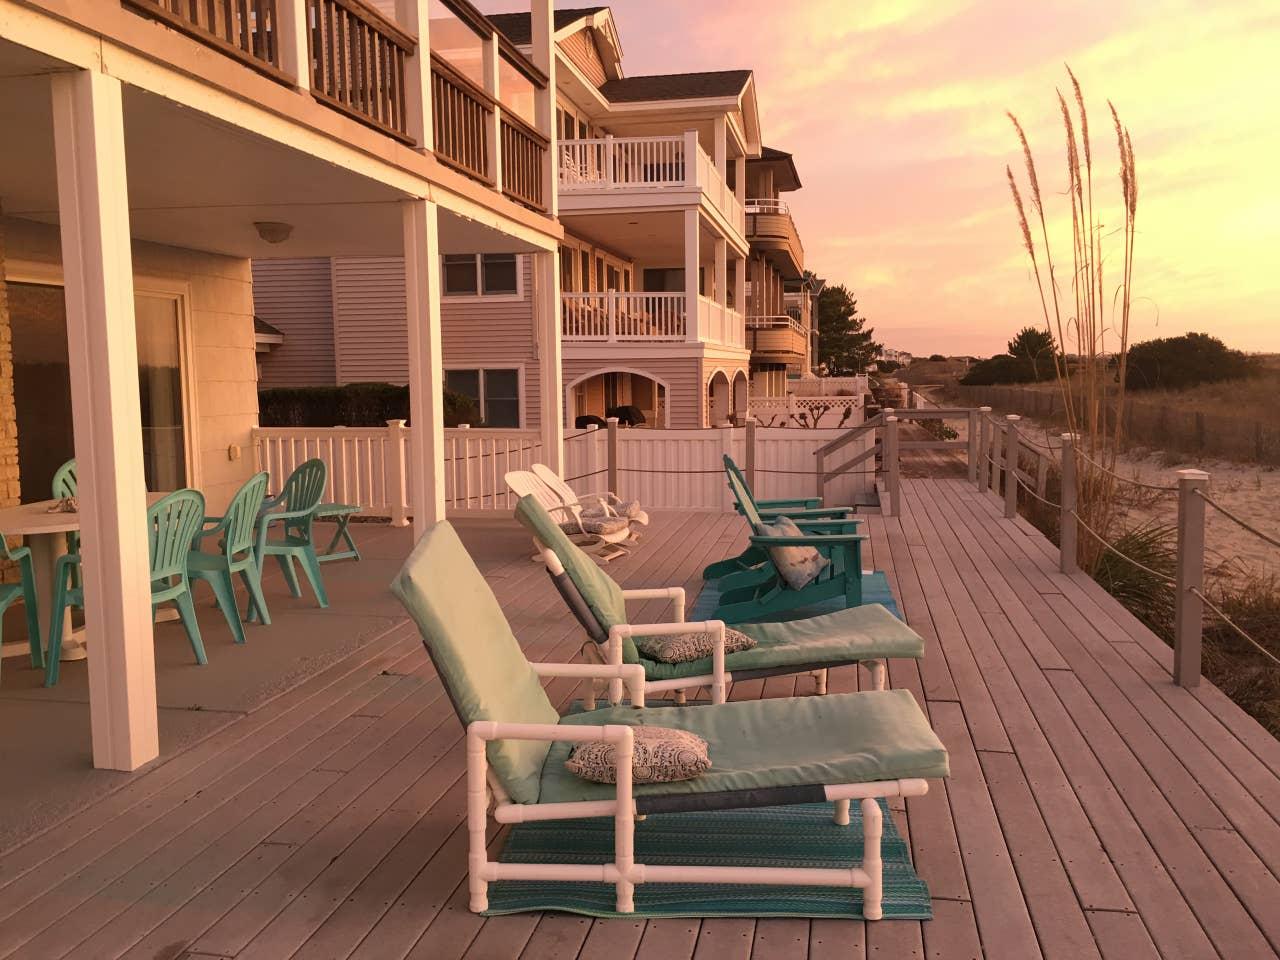 shabby chic beachhouse deck 1.jpg